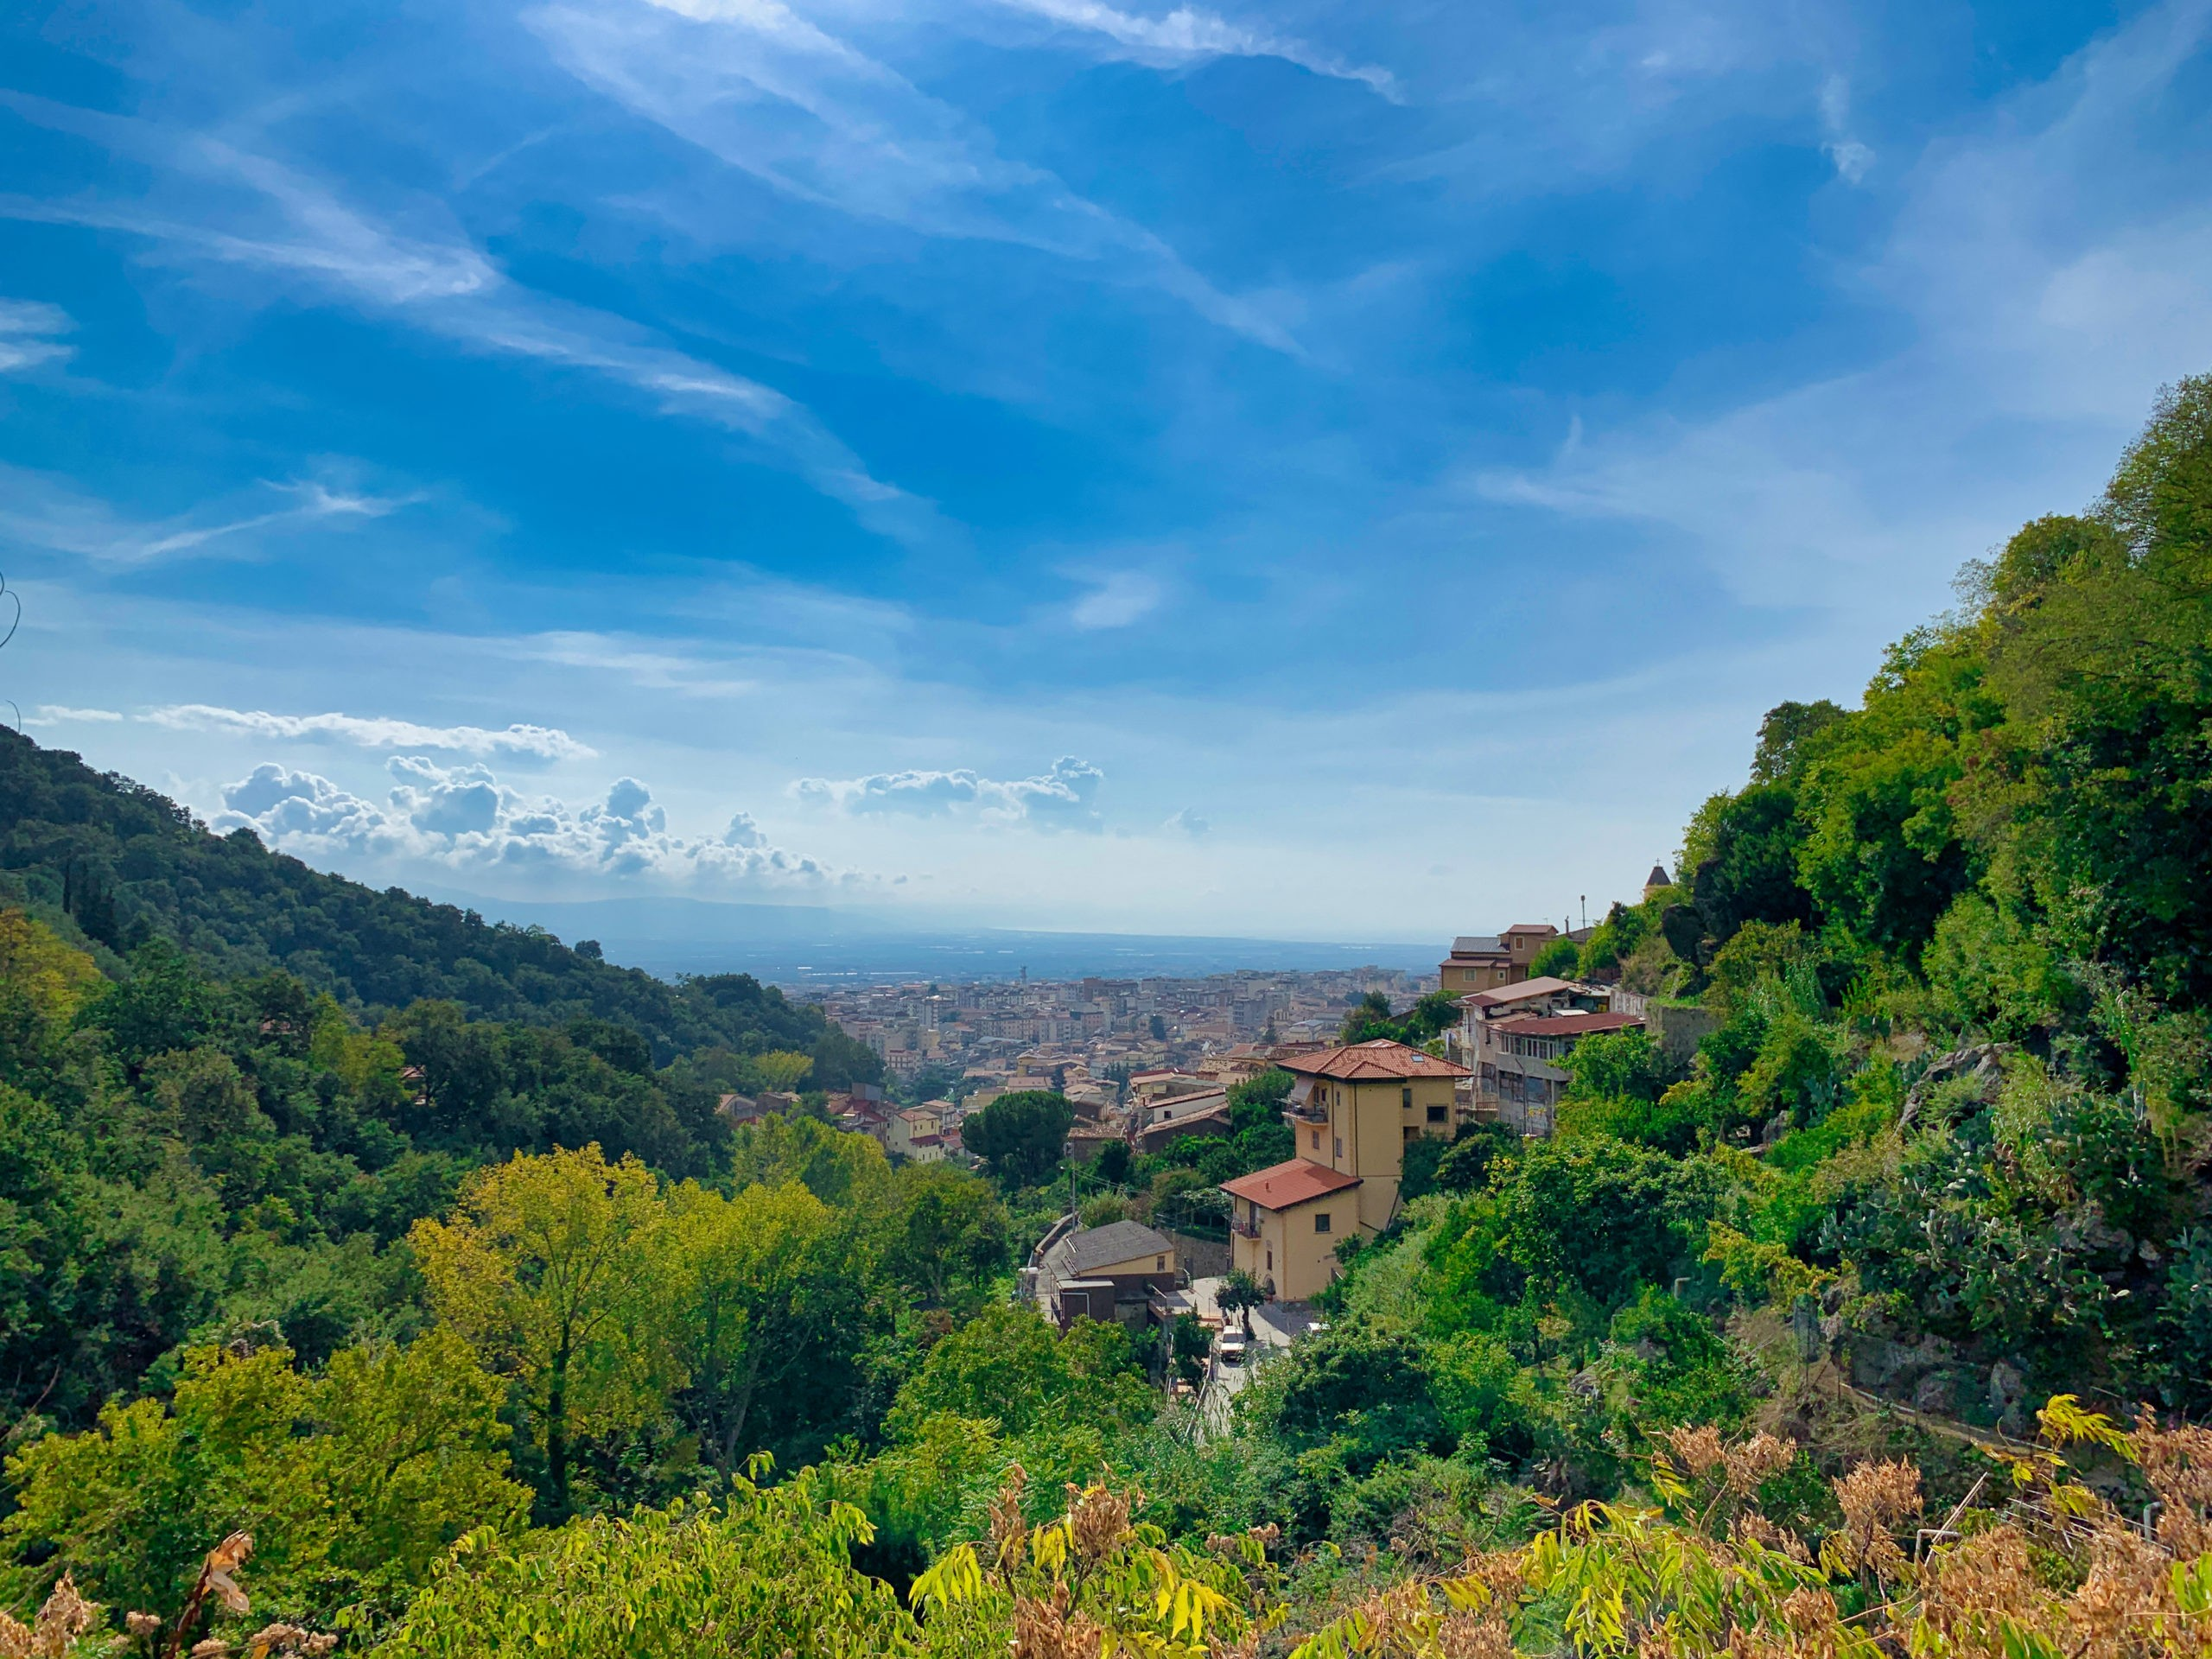 Panorama miasteczka Nicastro, części Lamezia Terme, fot. shutterstock.com